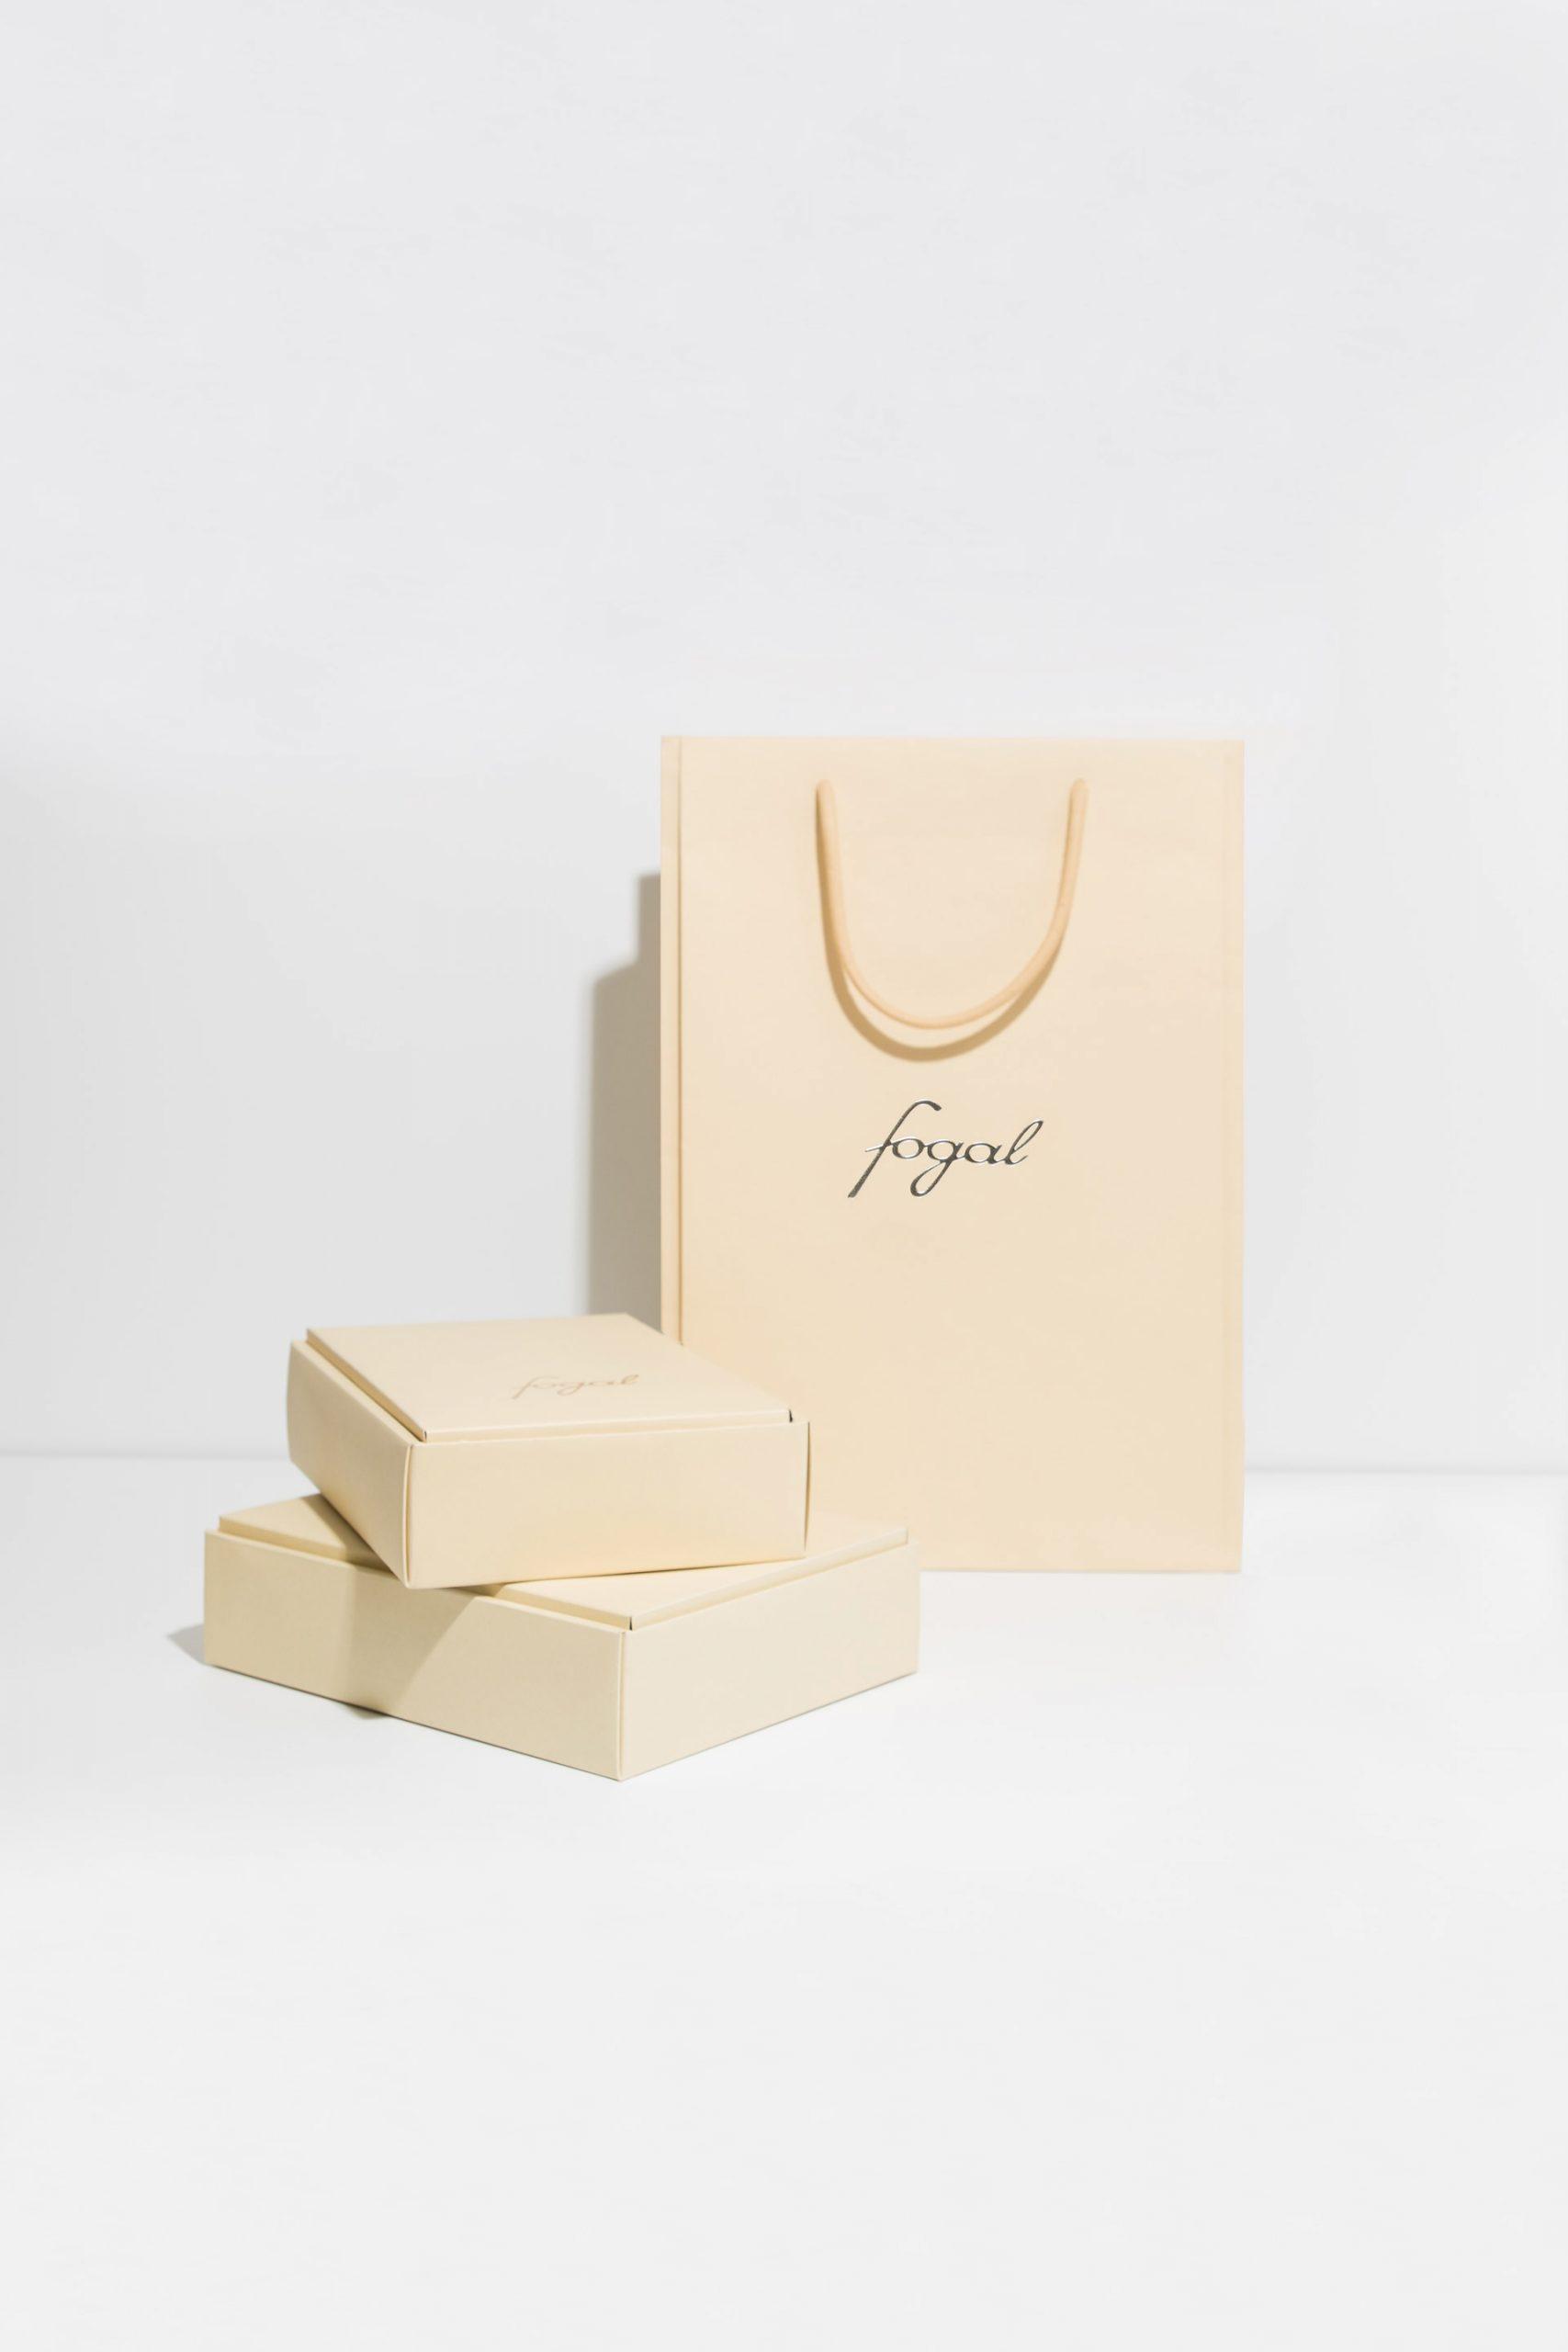 fogal-packaging-7